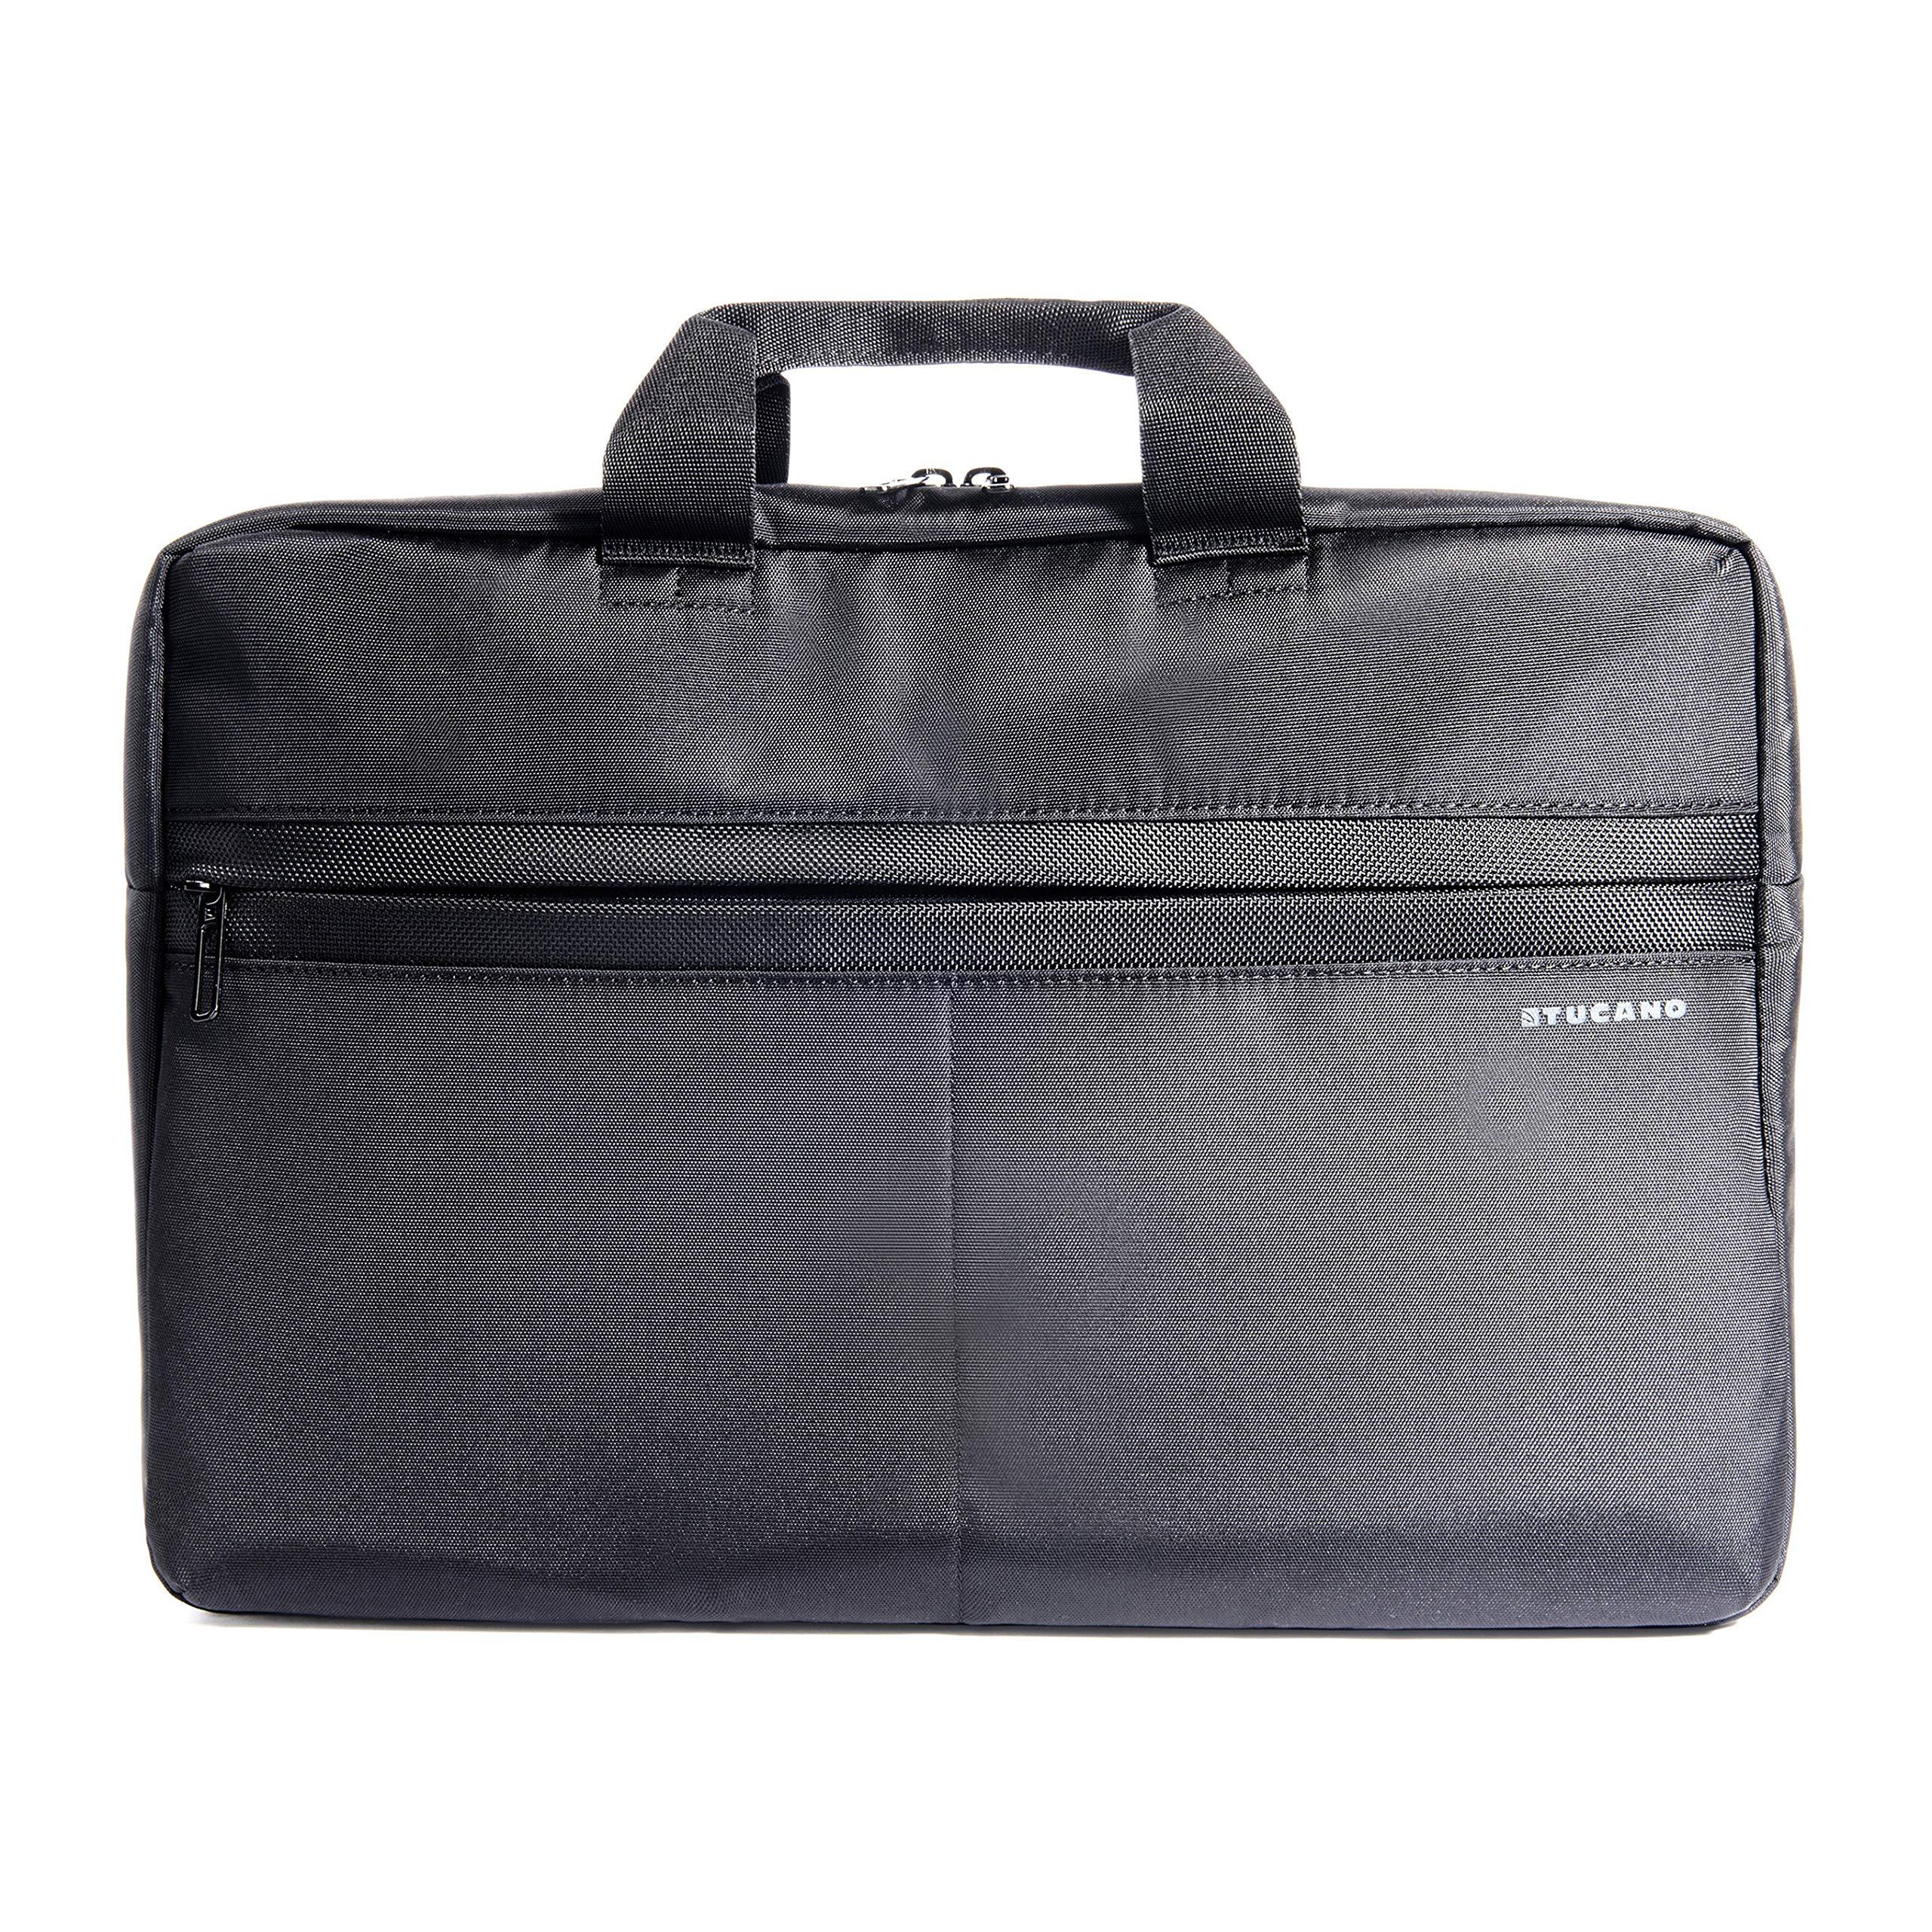 Tucano BTRA1314 Laptop Computer Bags & Cases